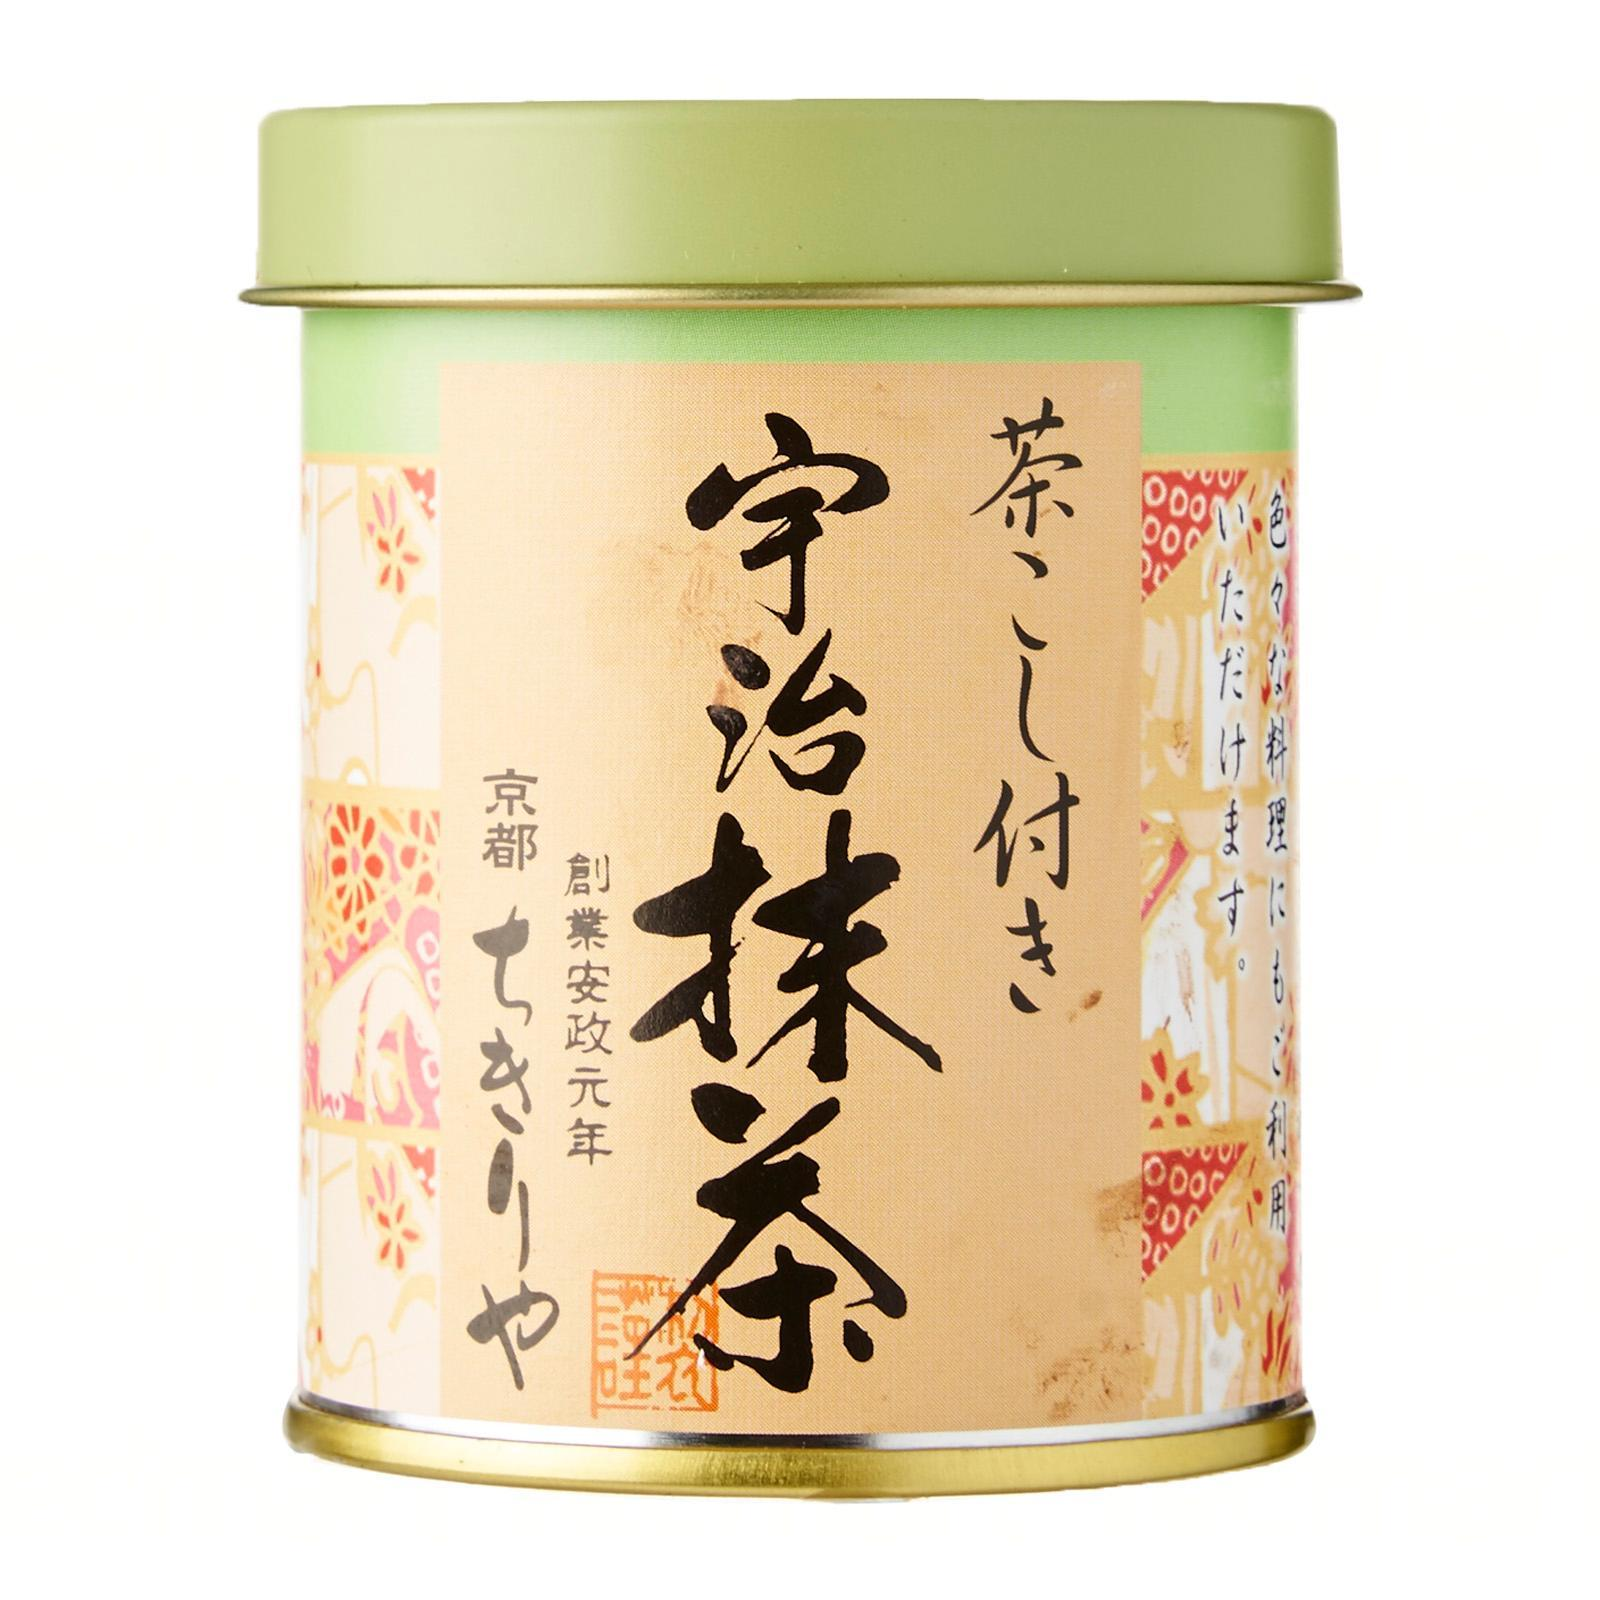 Chikiriya Chakoshi-Tsuki Uji Matcha Powder (Special Powder Sprinkle Bottle) - Kirei